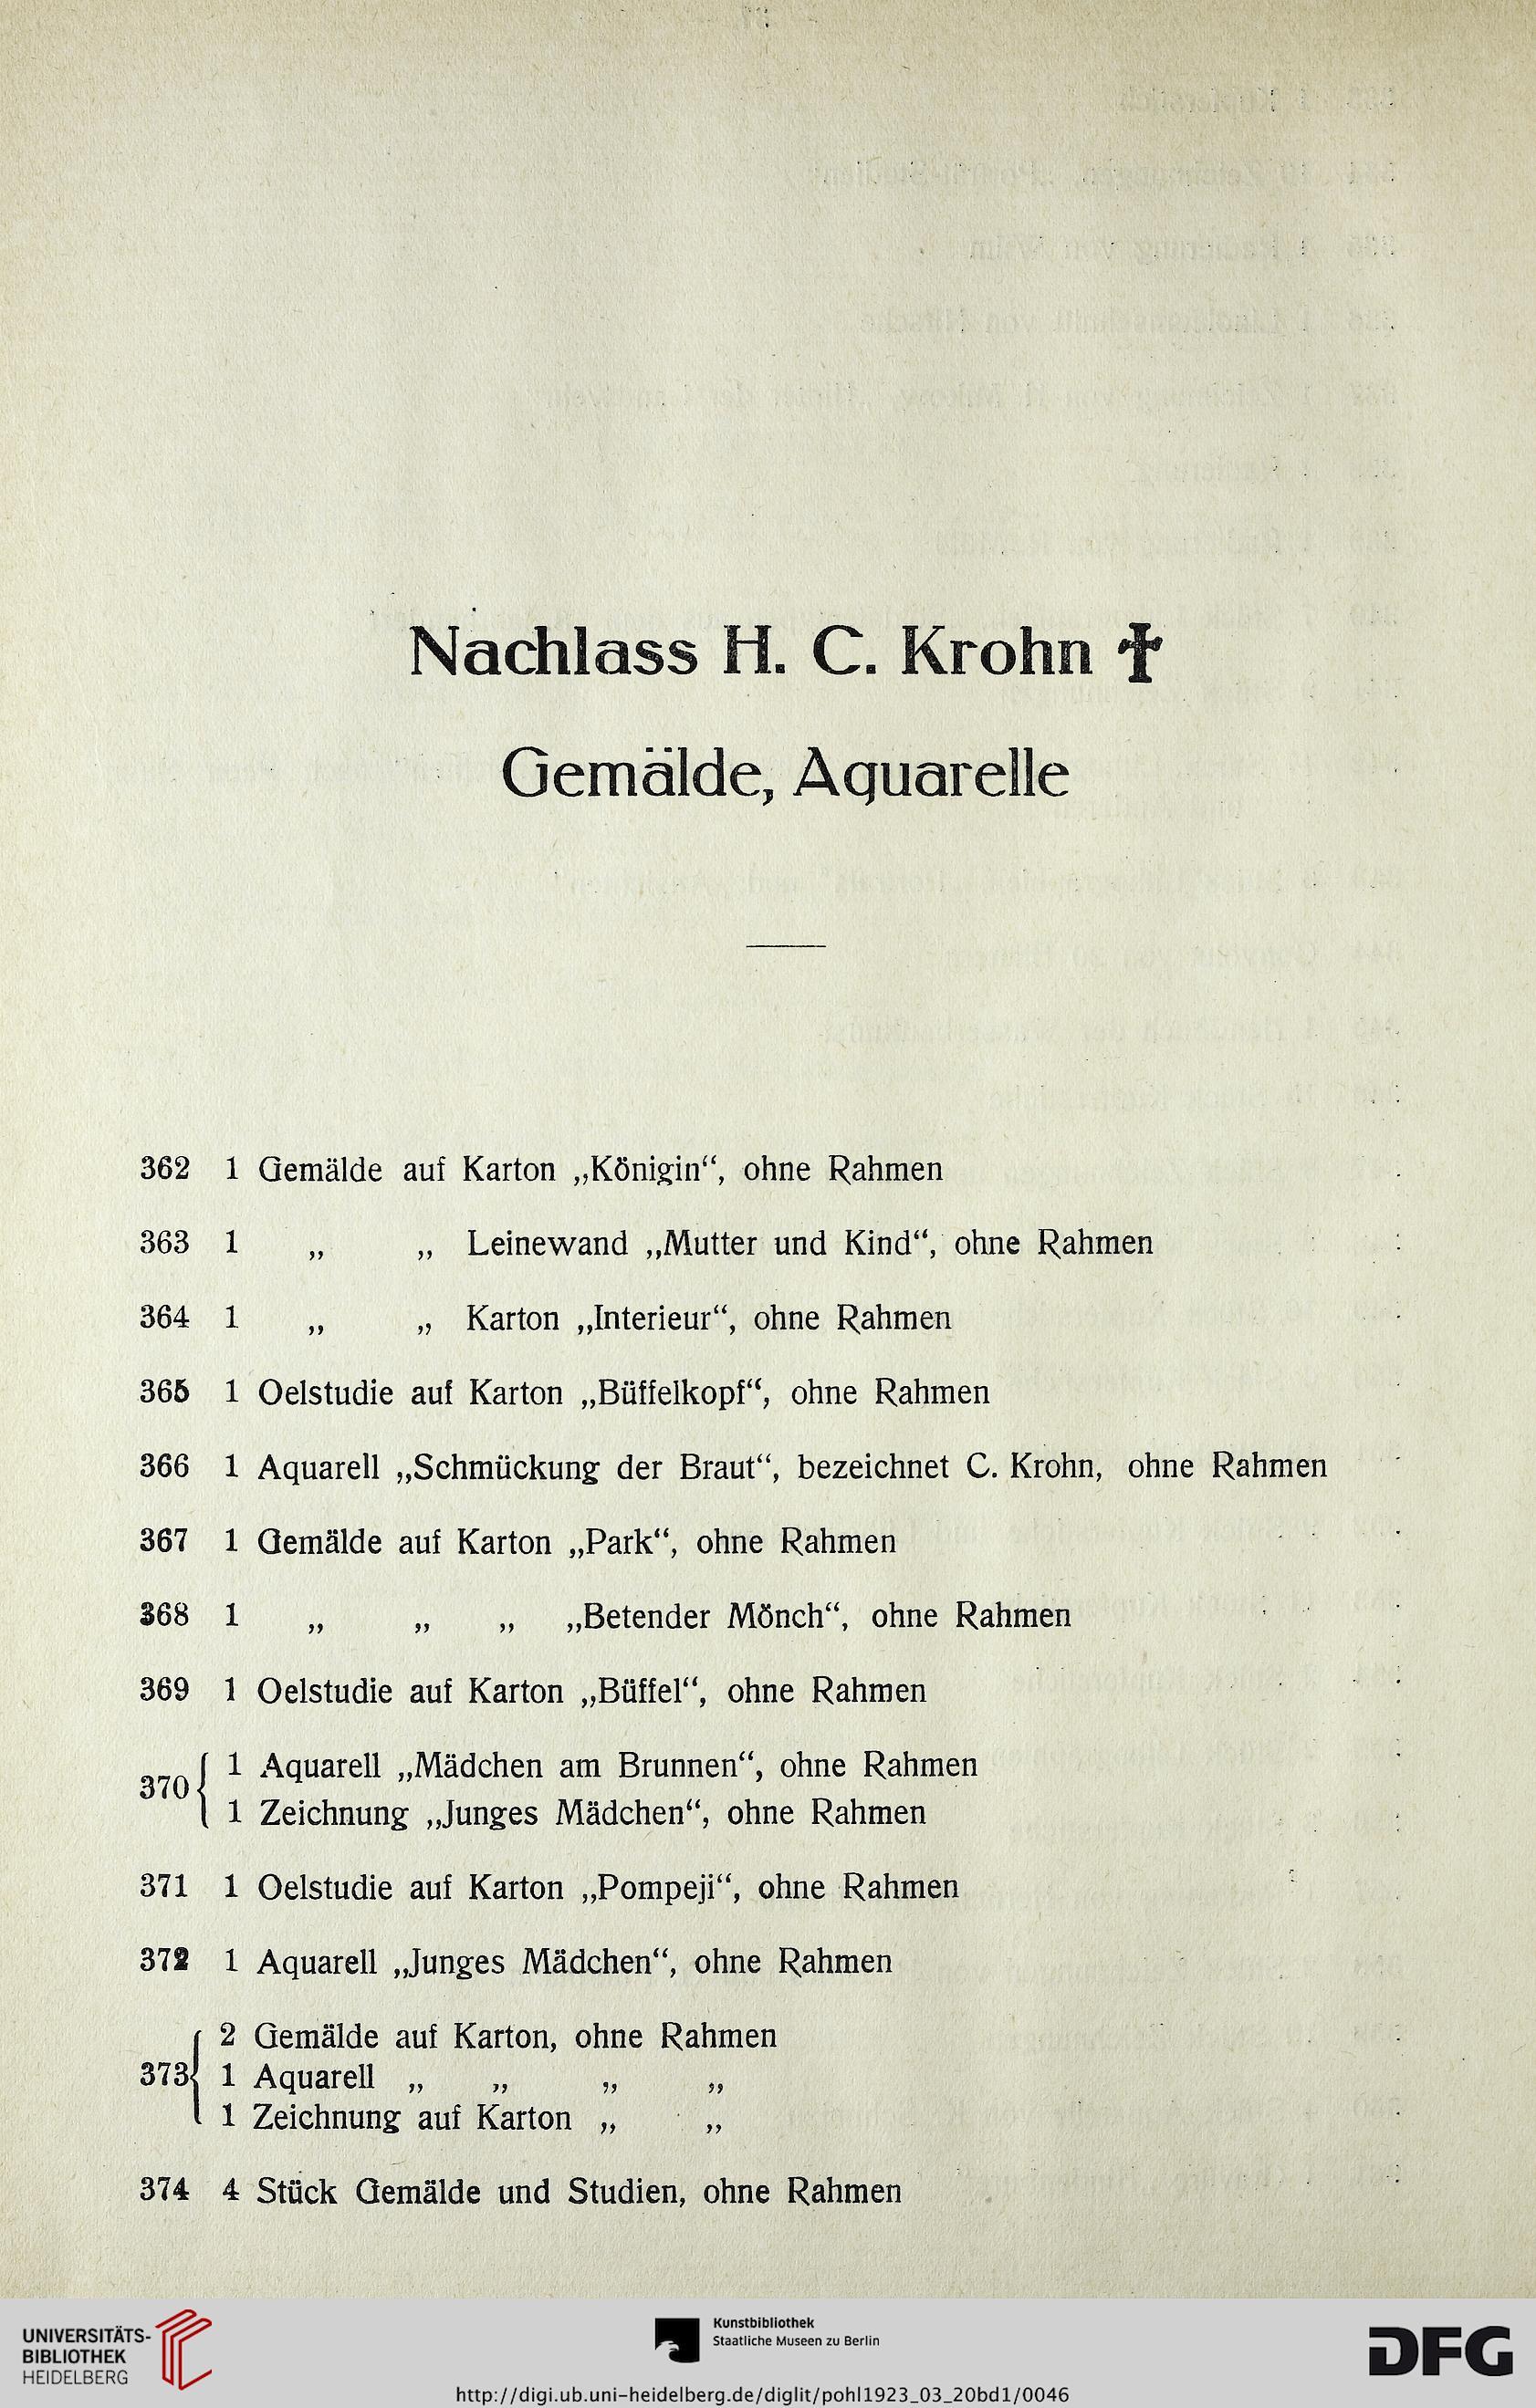 Kunst-Auktionshaus G. Adolf Pohl <Hamburg> [Hrsg.]: Galerie Rave ...